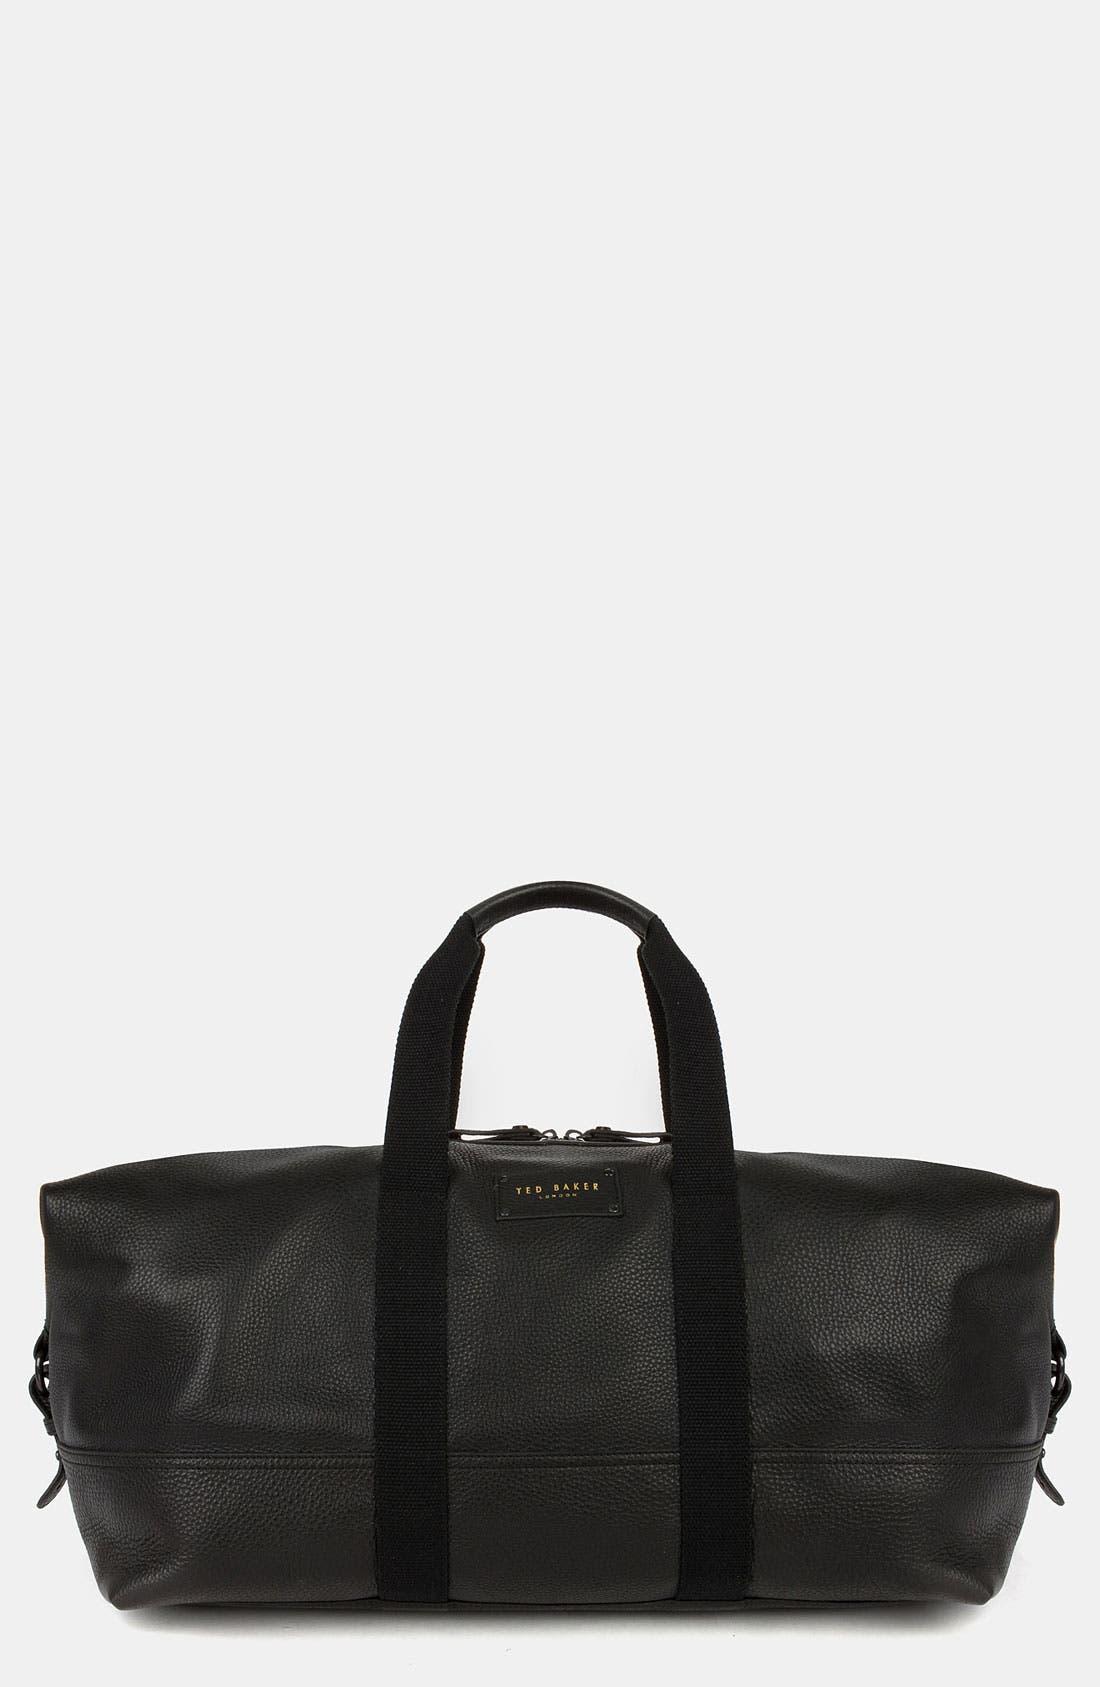 Leather Duffel Bag,                             Main thumbnail 1, color,